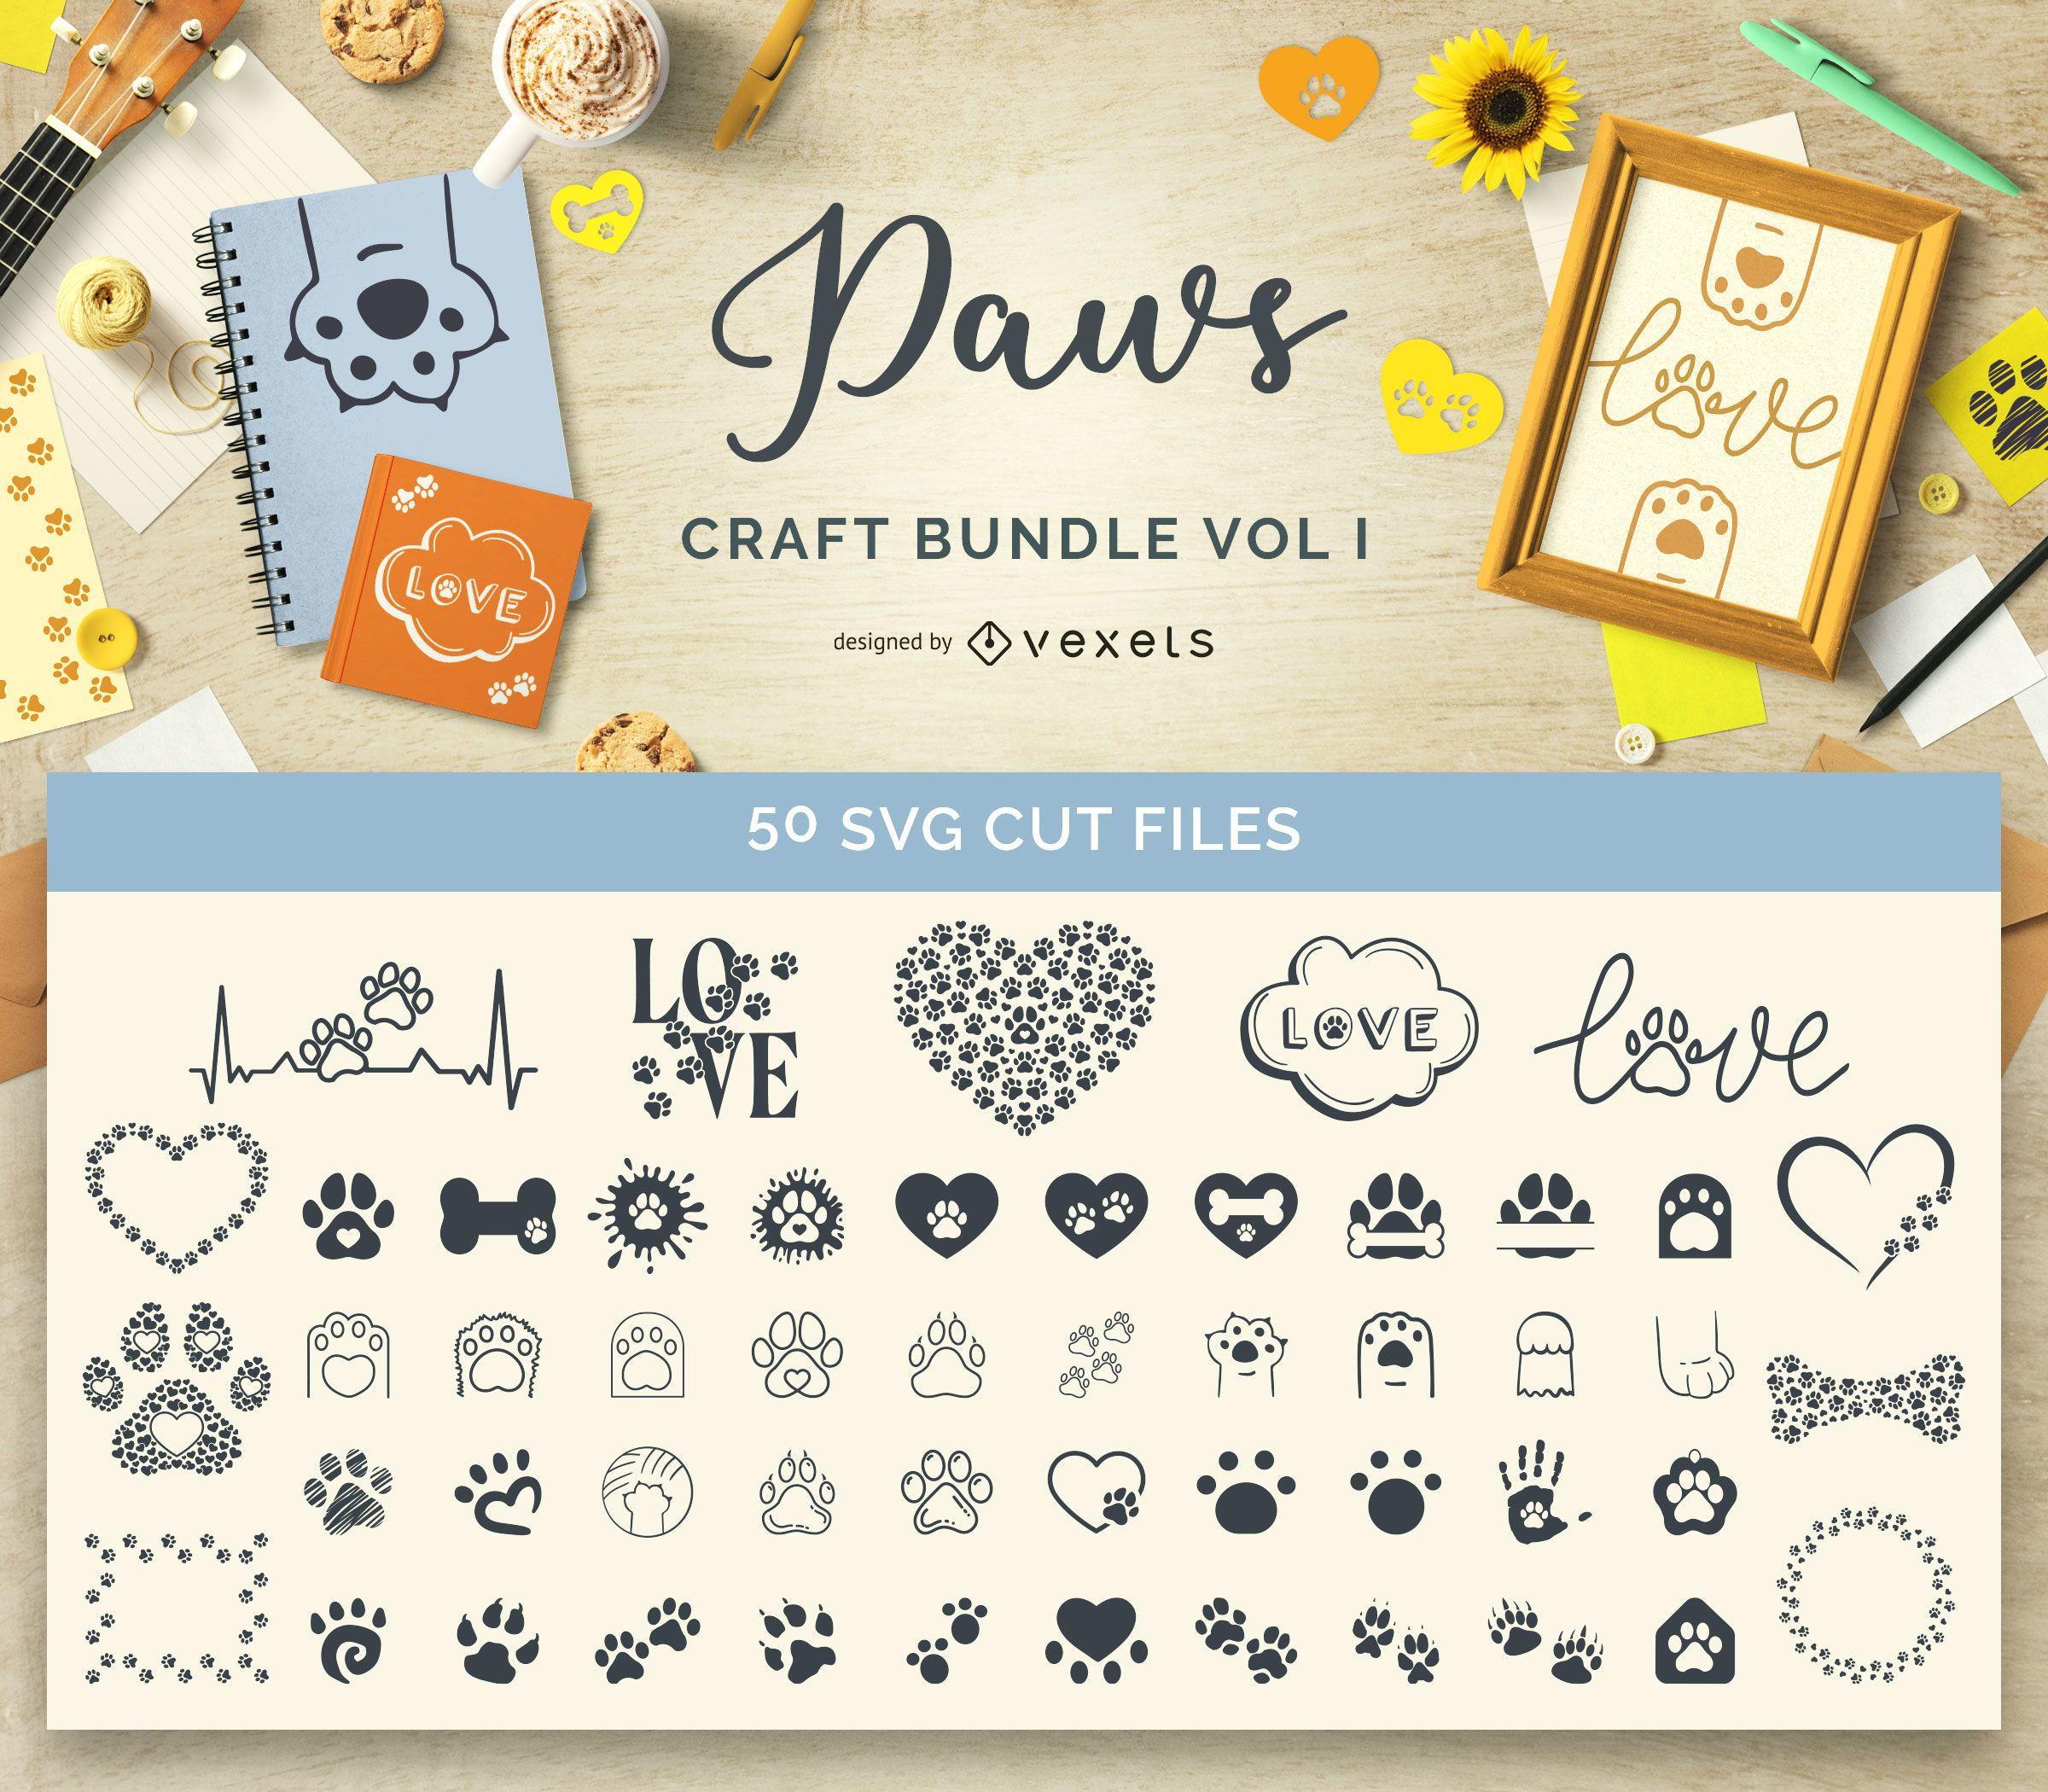 Animal Paws Craft Bundle Vol I